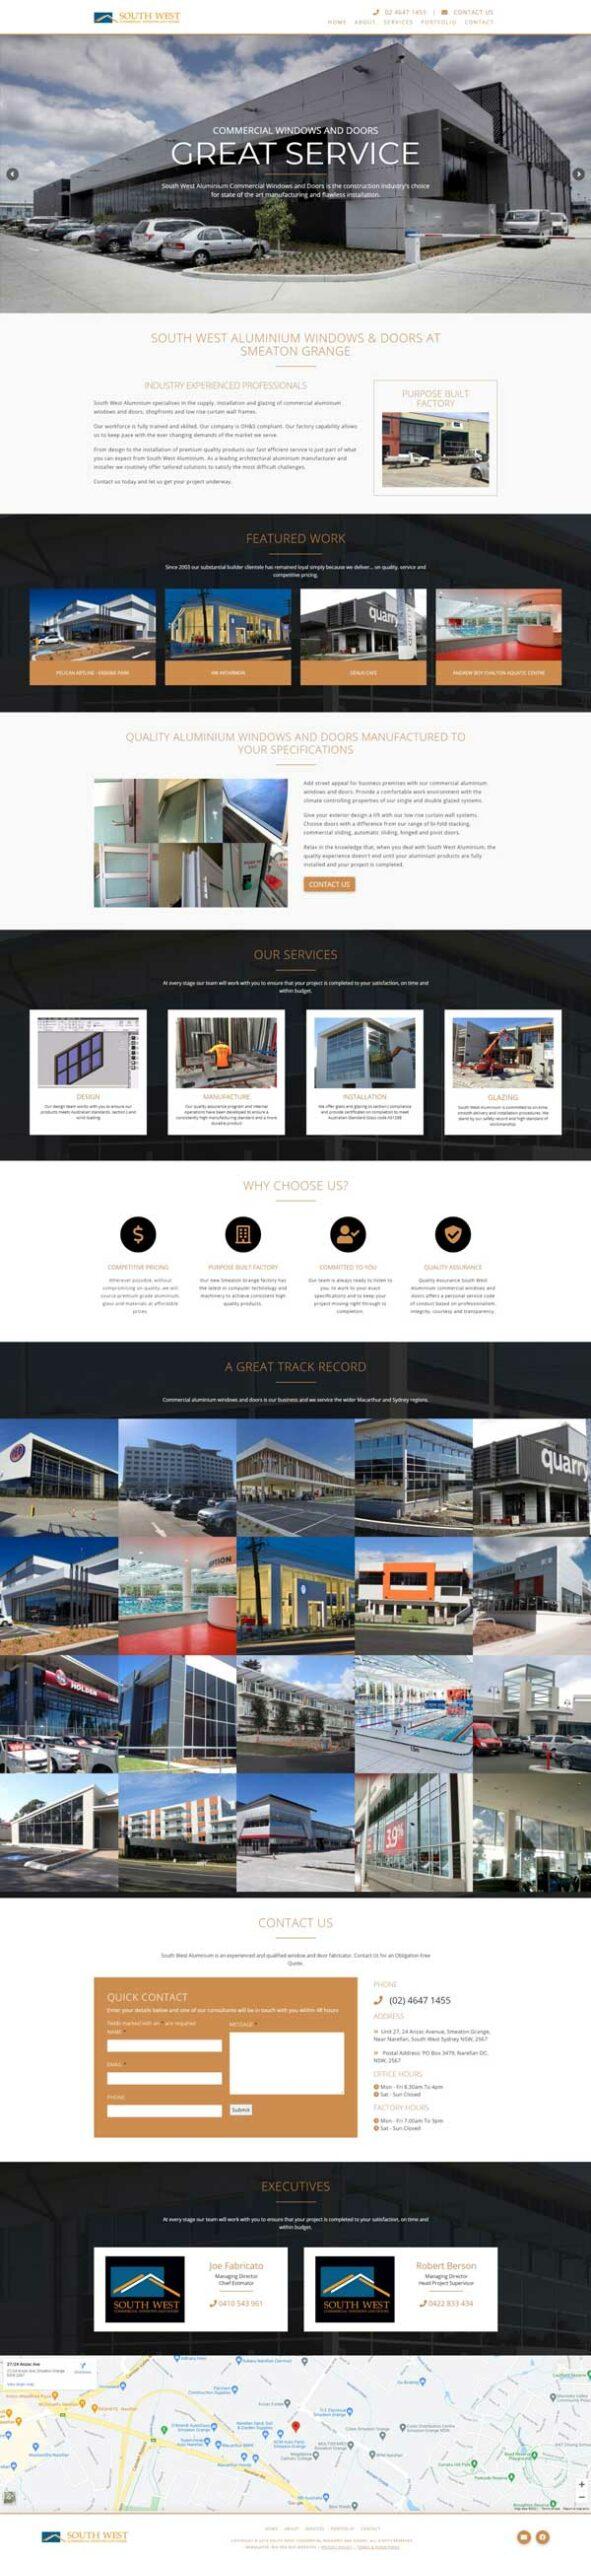 South West Commercial Windows & Doors website designed by Big Red Bus Websites - ezample 1